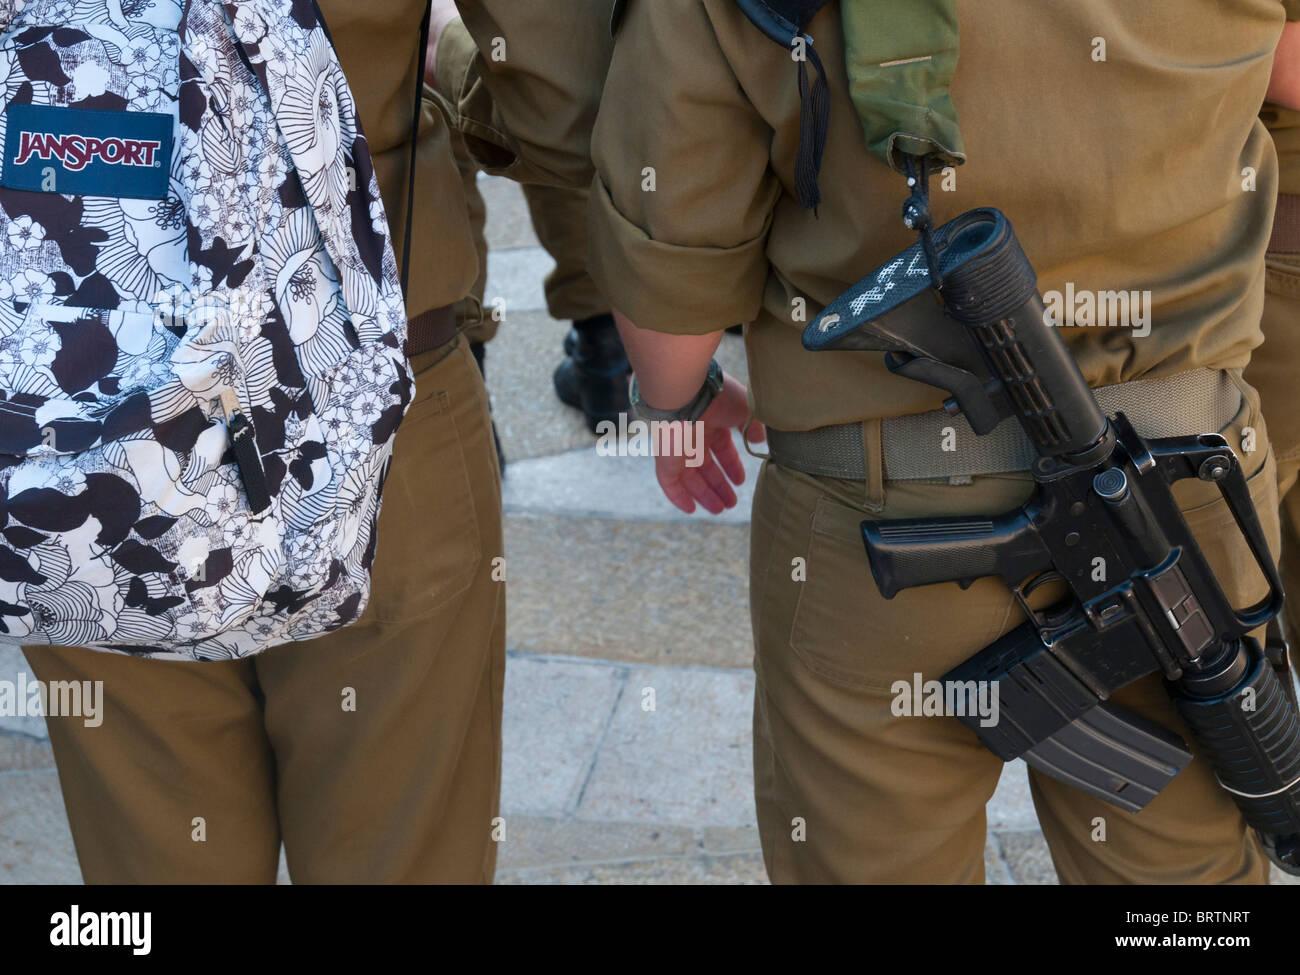 Female Soldiers Stockfotos & Female Soldiers Bilder - Alamy